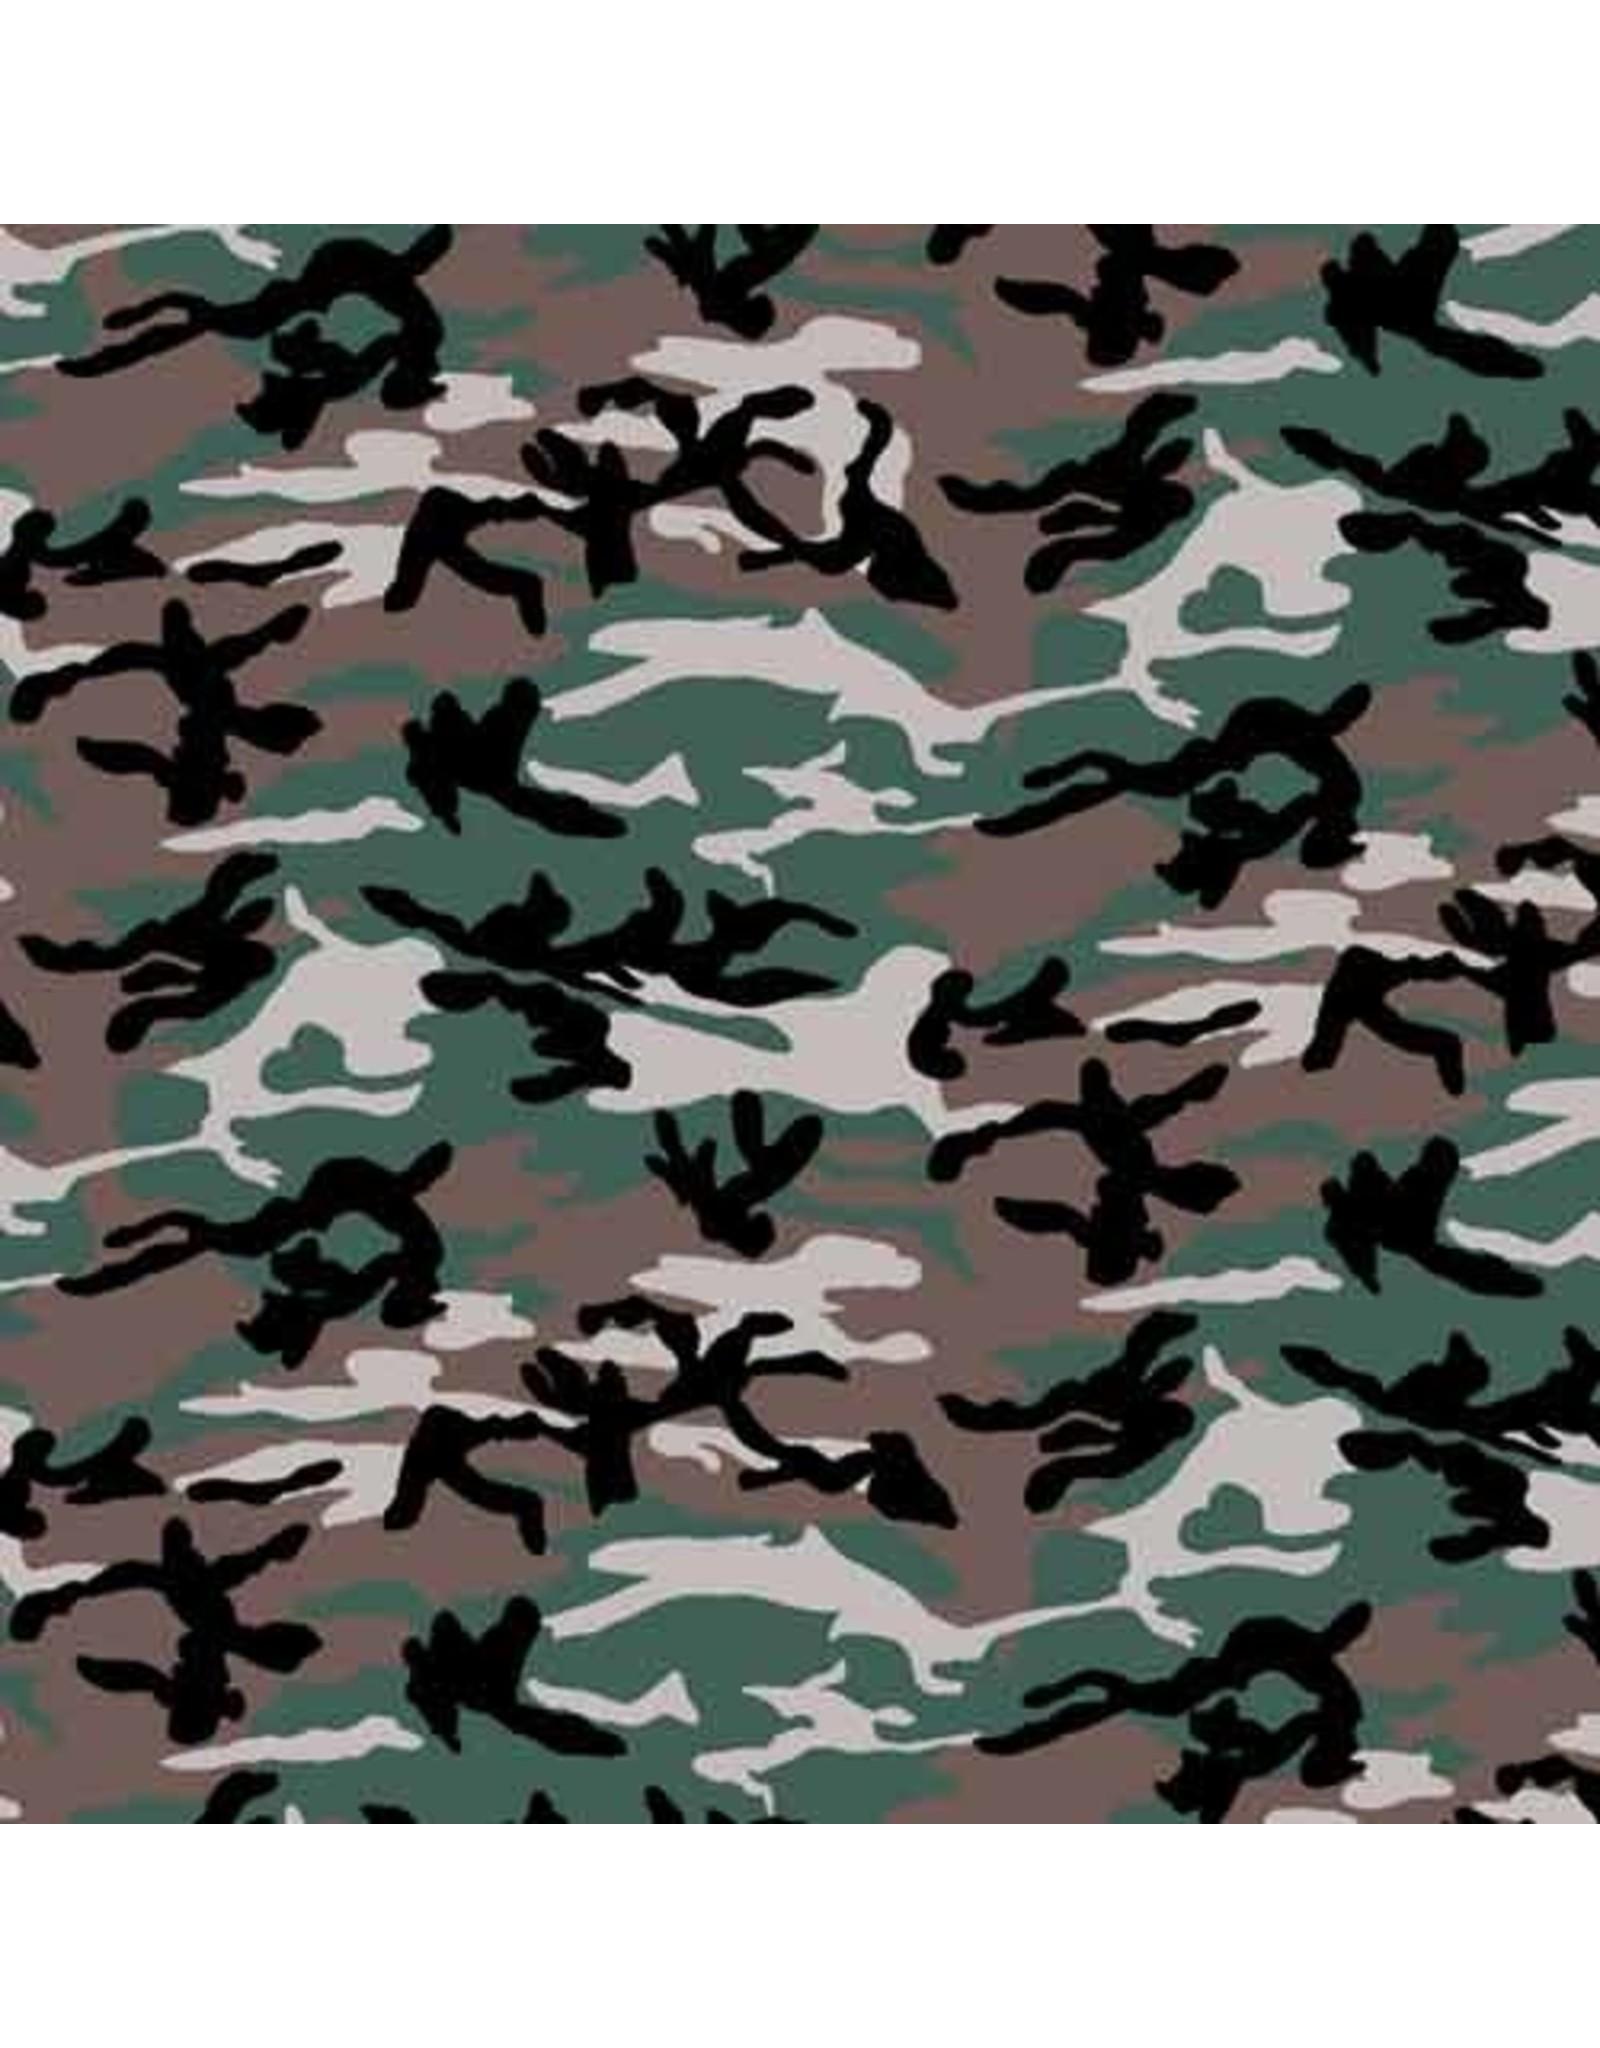 The Bandanna Co. Bandanna Co. Camouflage Woodland 22'' X 22''